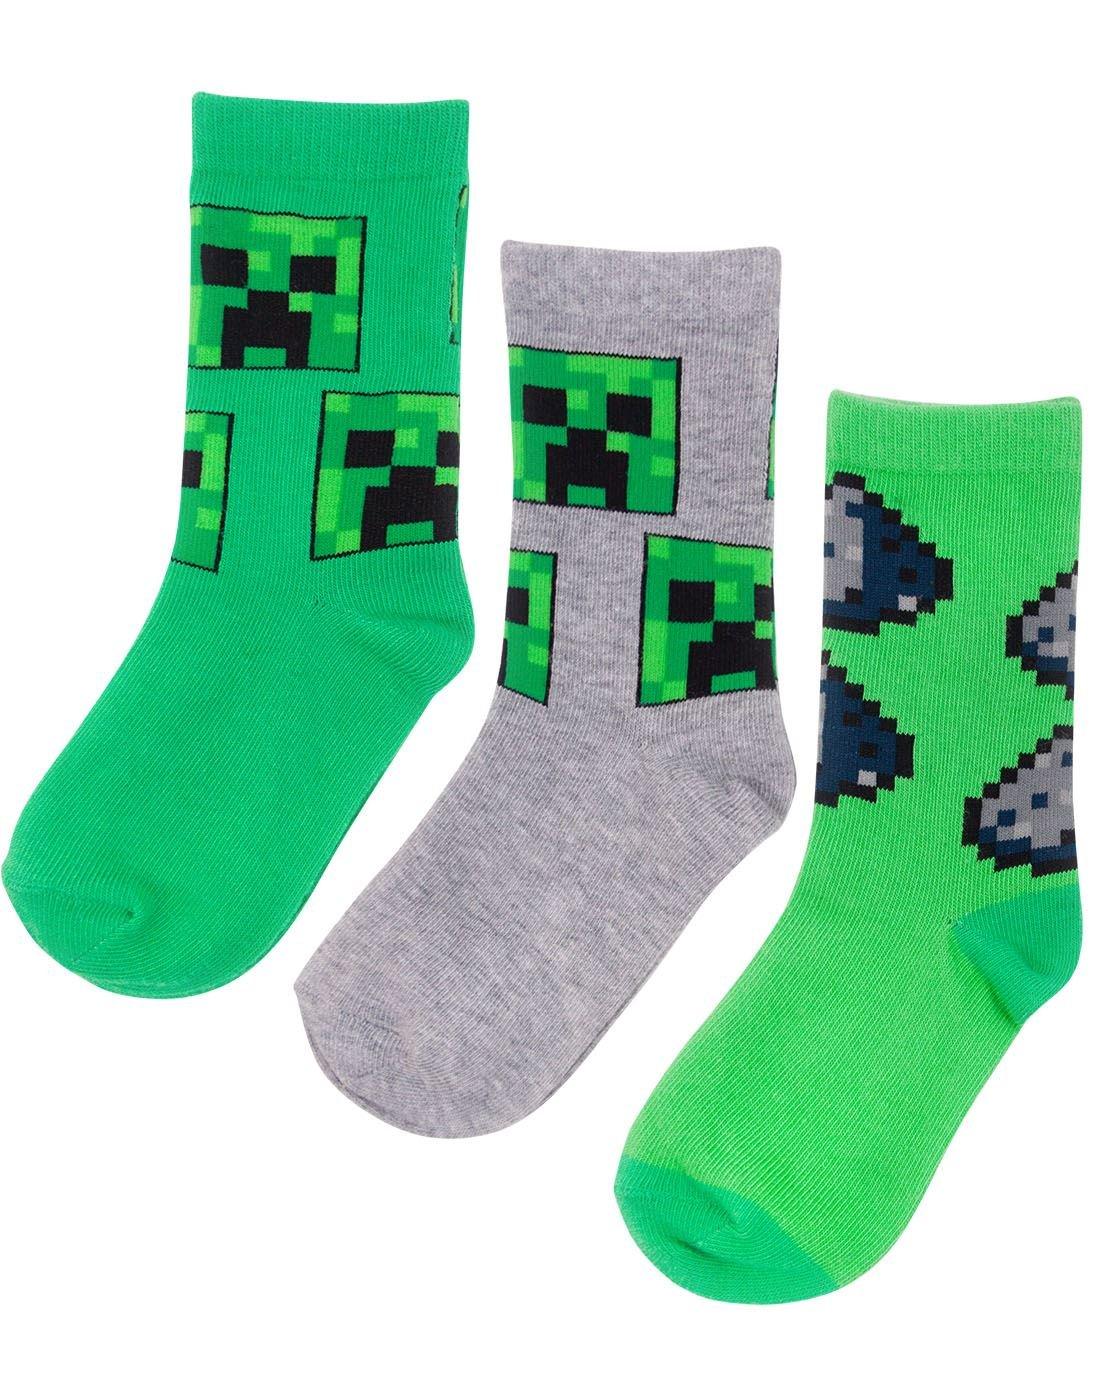 Minecraft Creeper Boy/'s Green Slipper Socks Sizes from 11 UK Kids to 3 UK